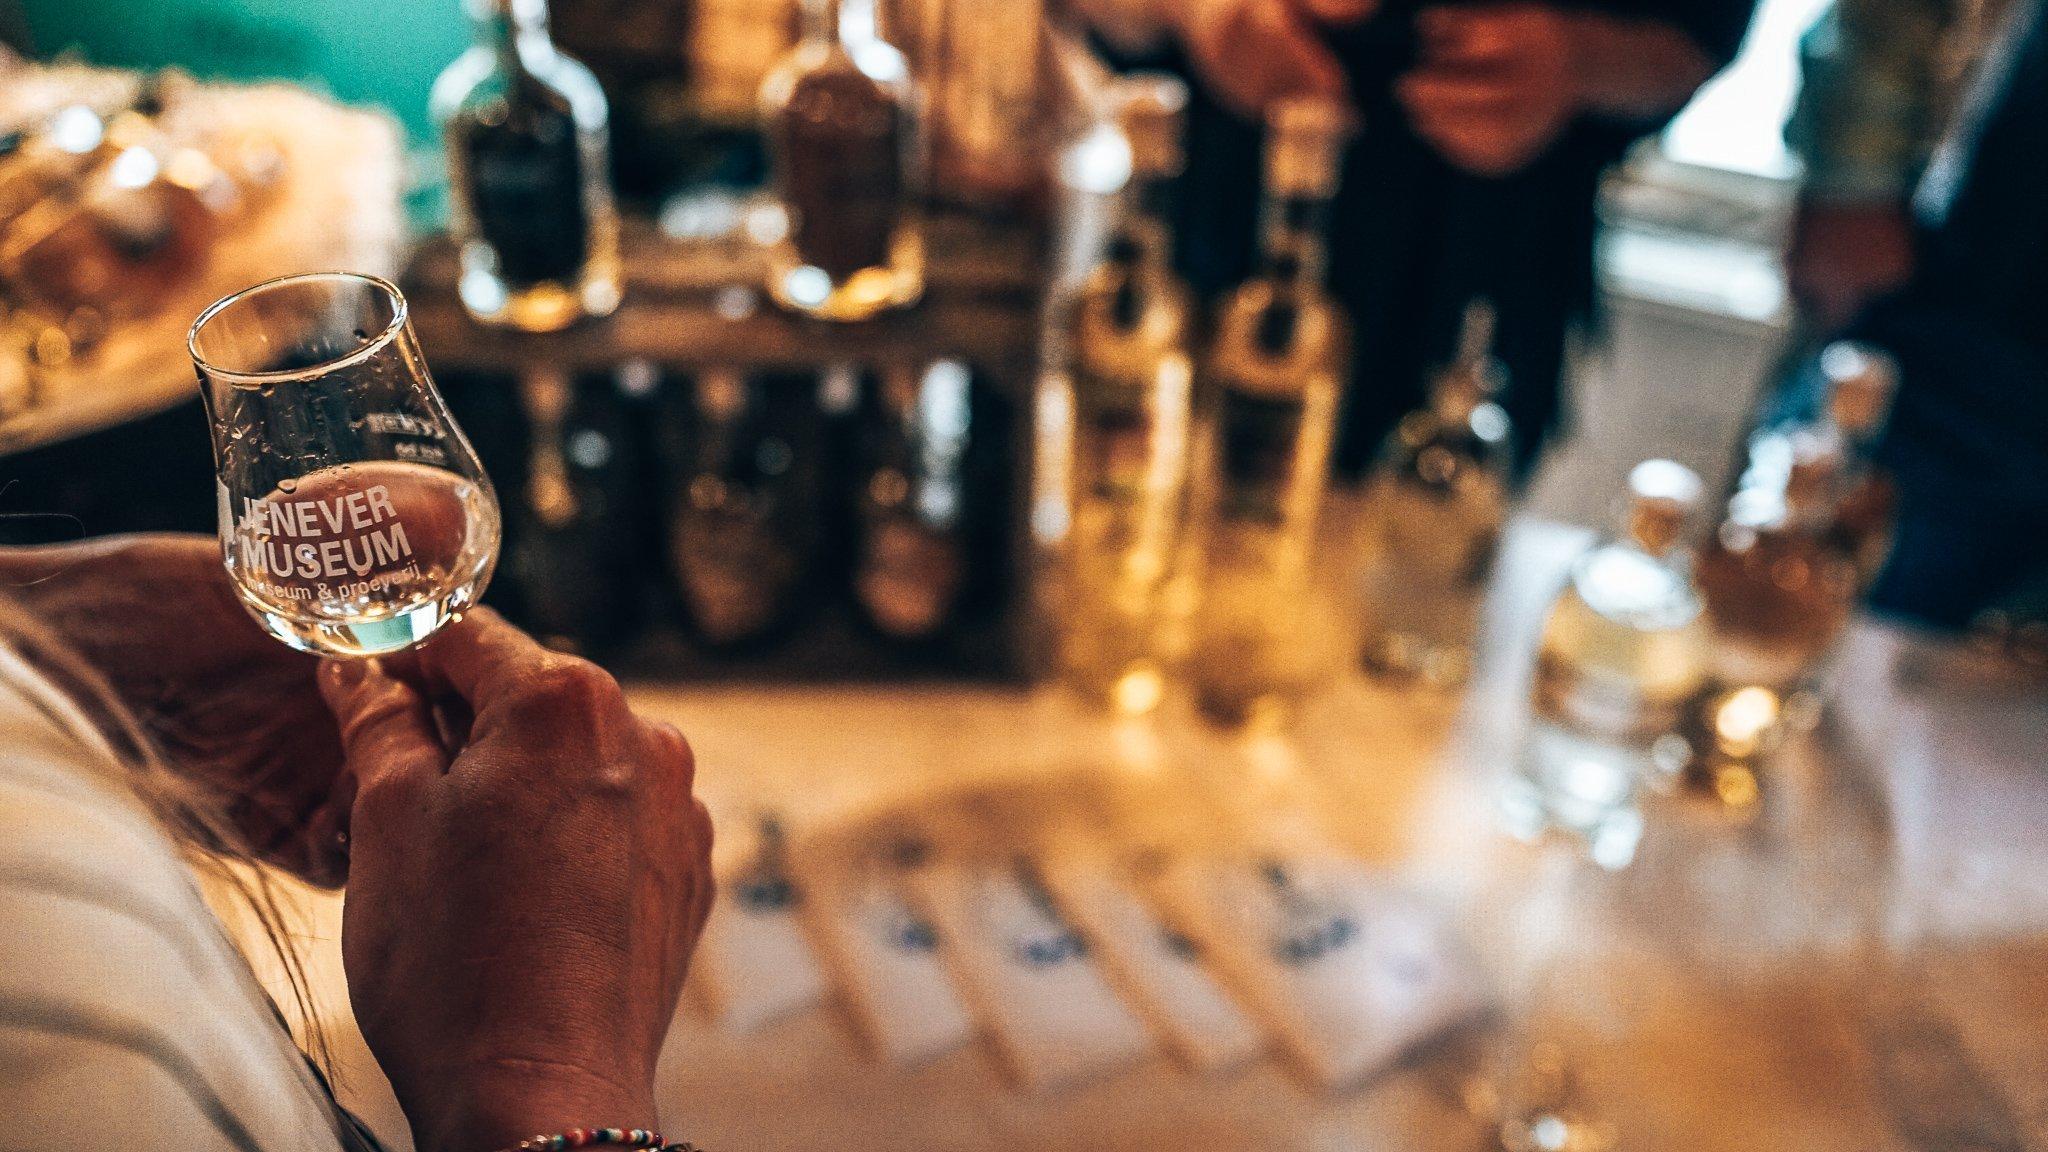 Proefglaasje GinFever, Schiedam, Alles over gin.